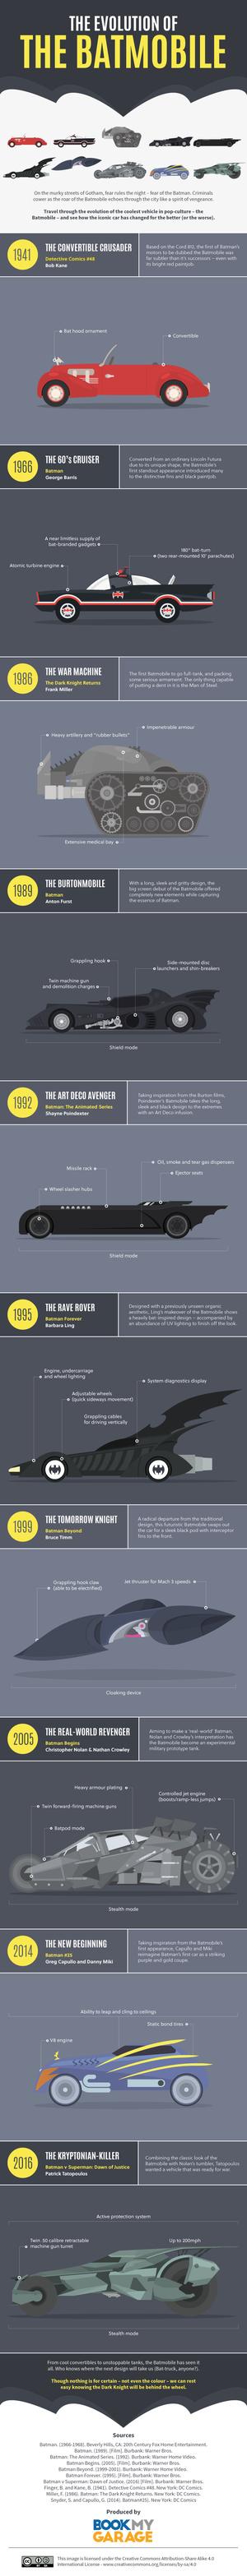 the-evolution-of-the-batmobile